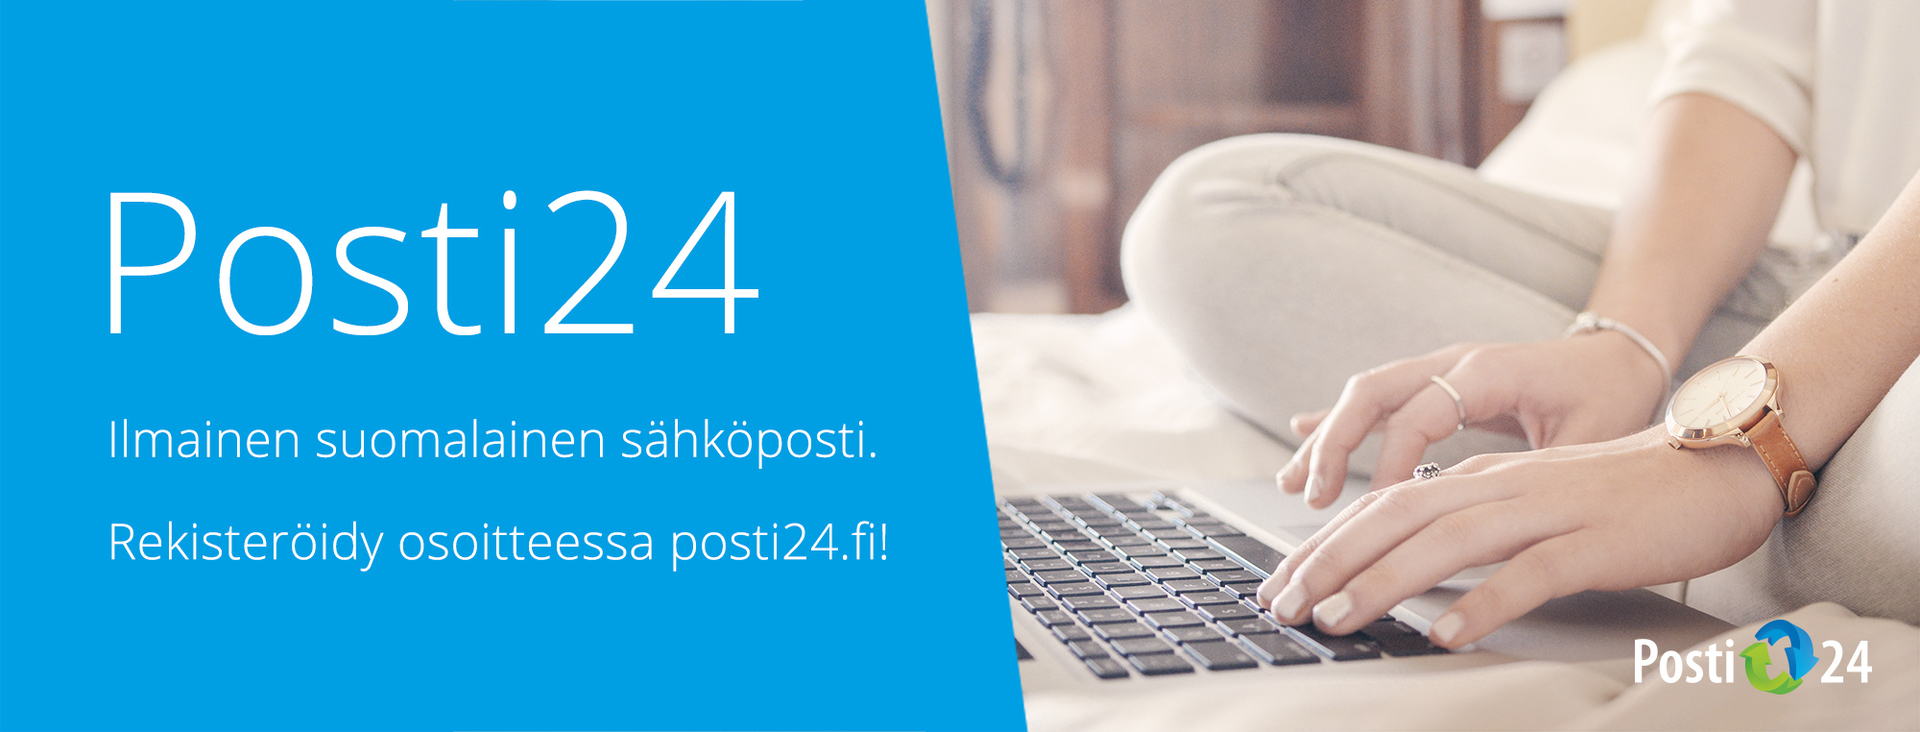 Posti24 sähköposti